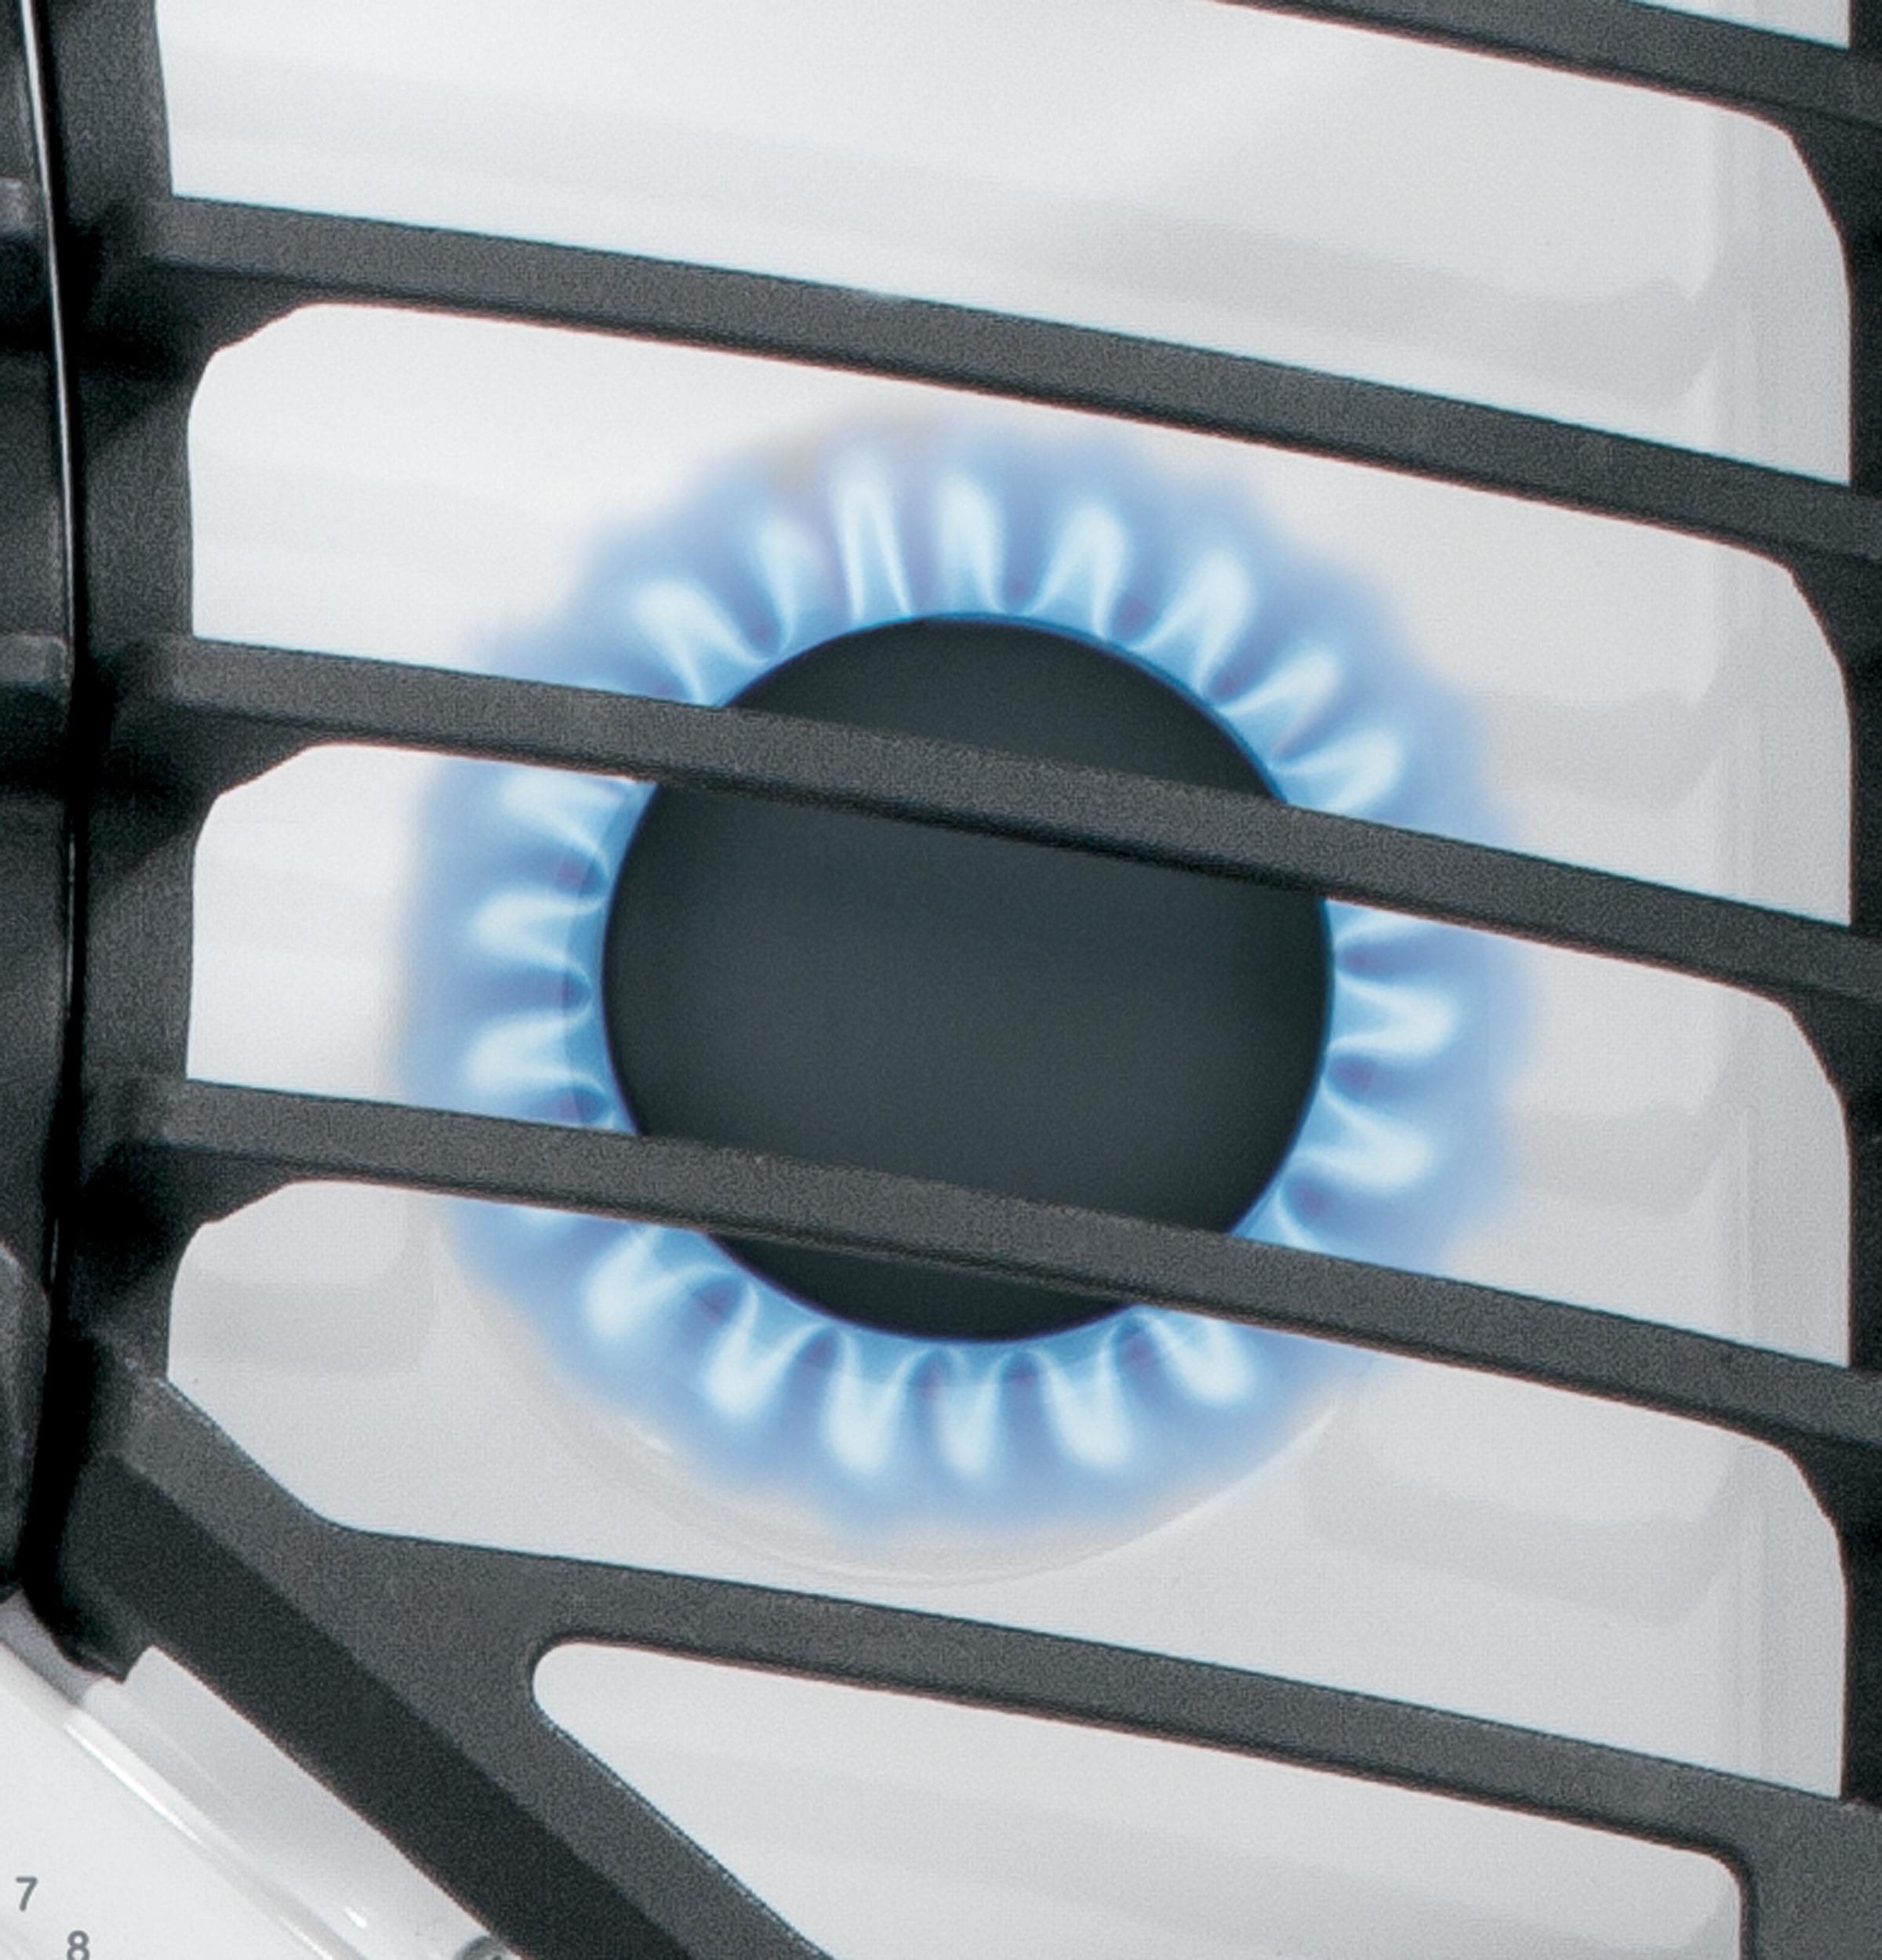 "Model: PGP953DETWW | GE Profile GE Profile™ Series 30"" Built-In Gas Cooktop"